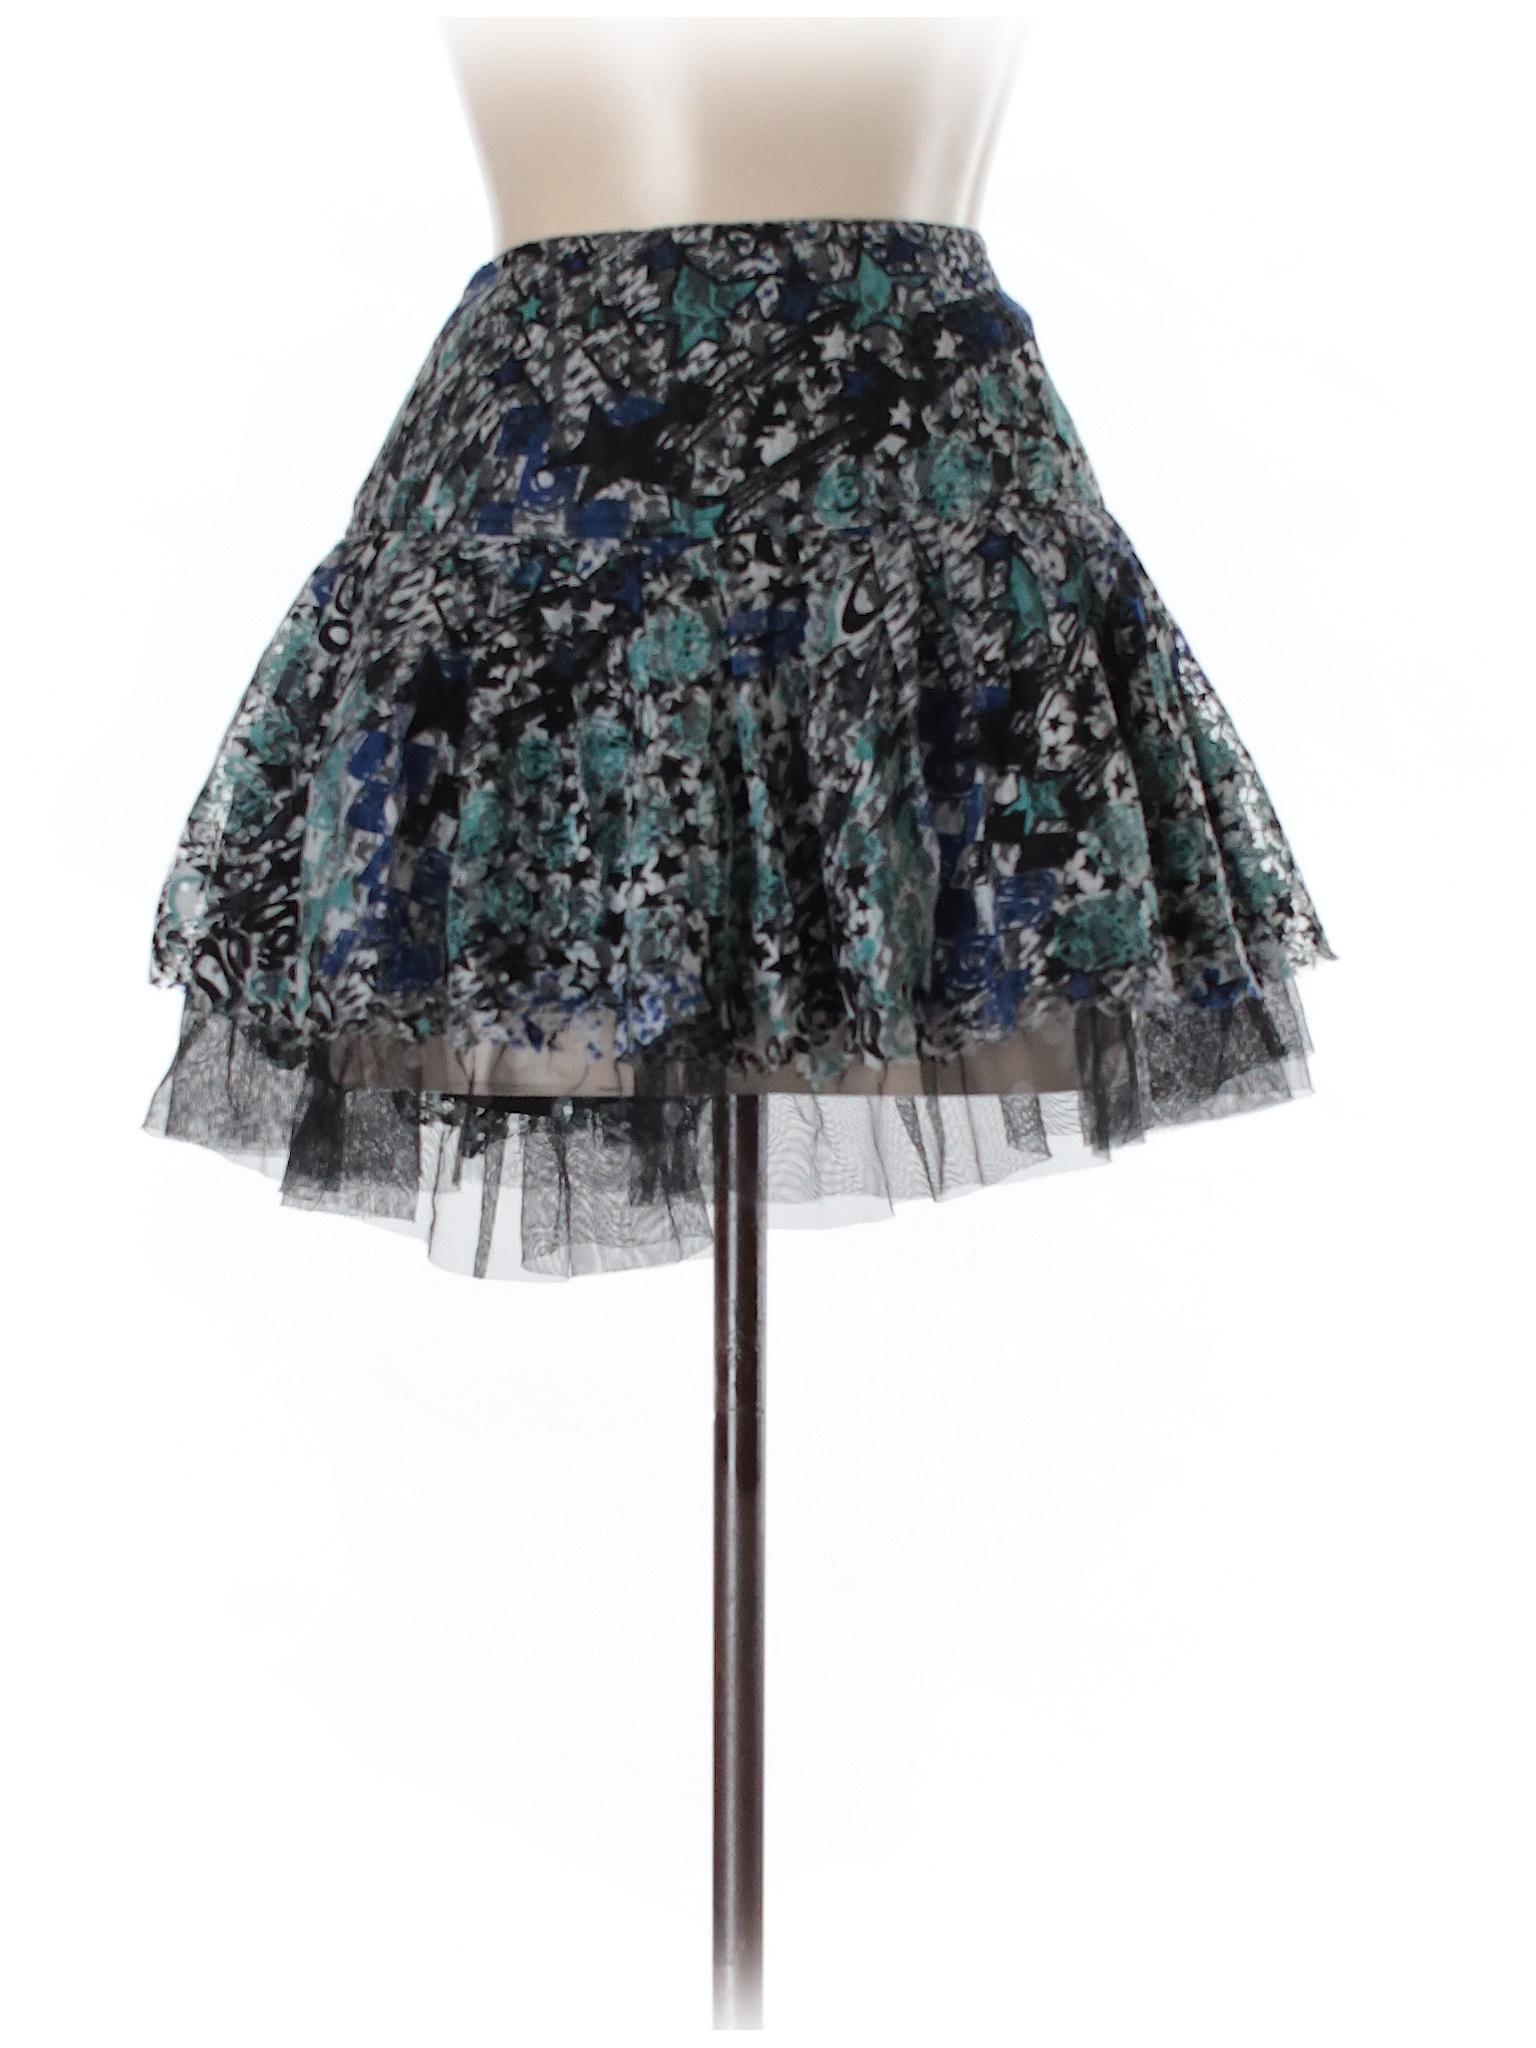 Boutique Boutique Casual Skirt Casual Boutique Skirt vtrUtwYq1